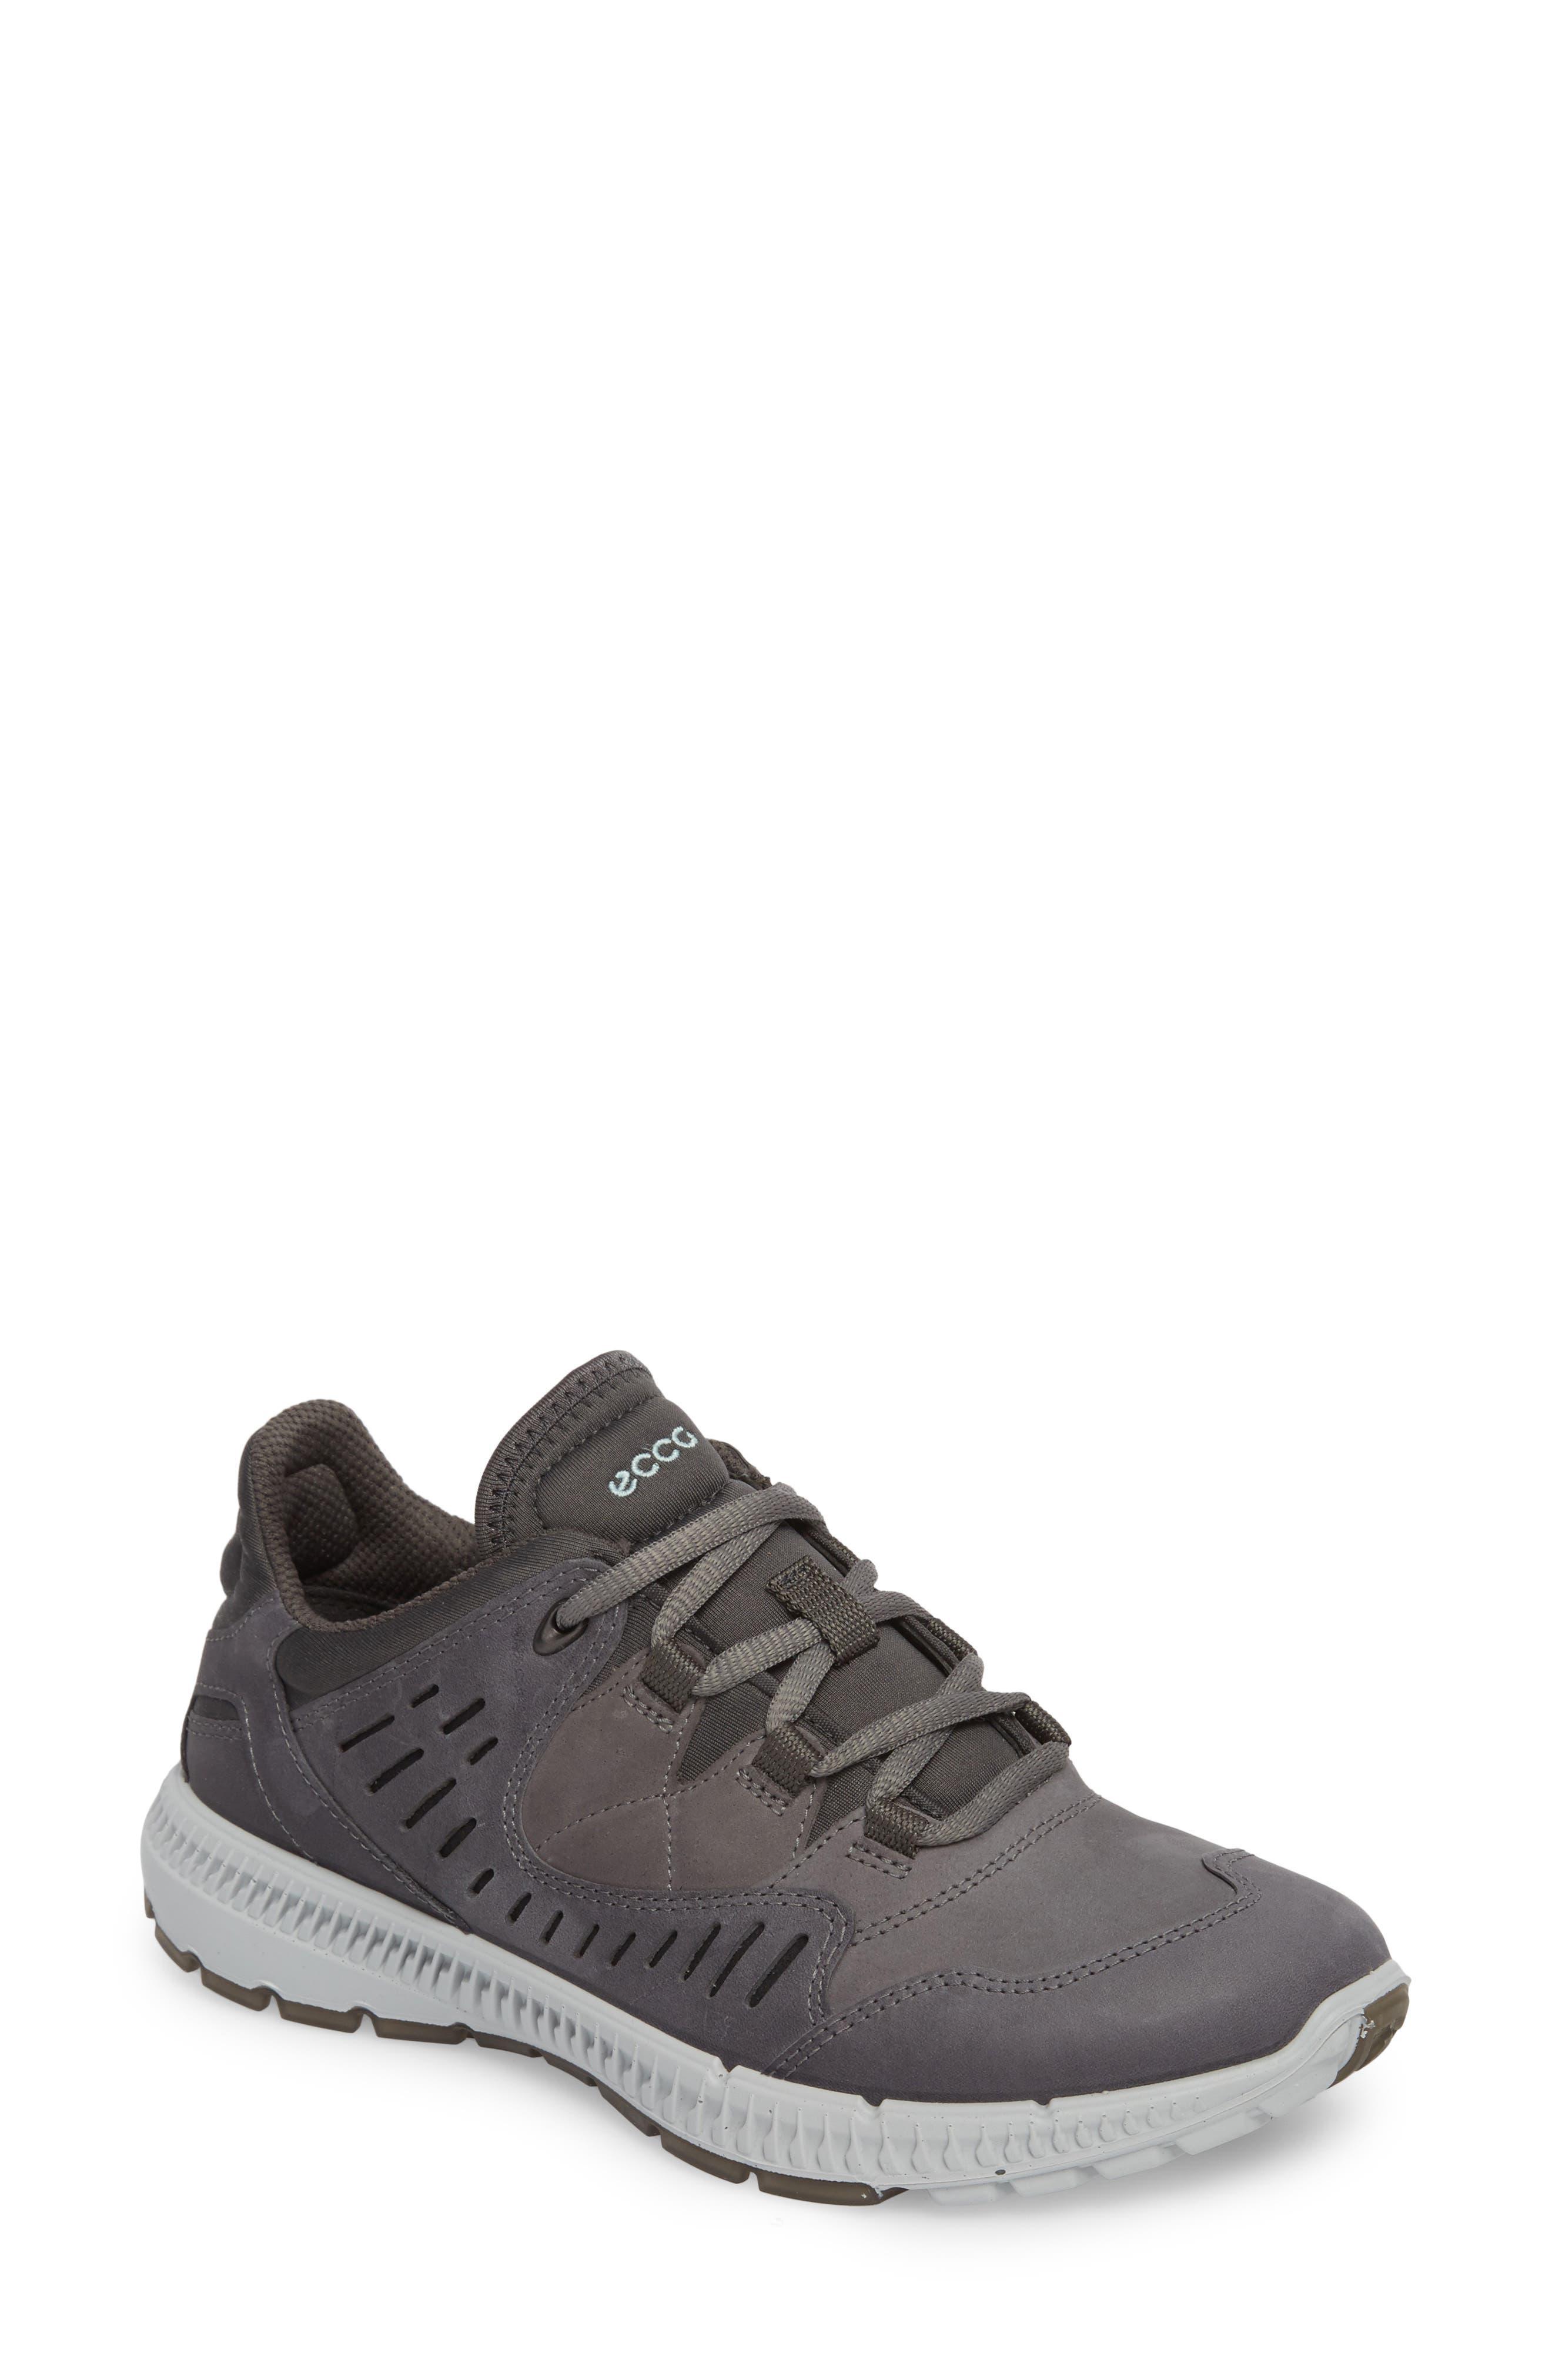 Terrawalk Sneaker,                         Main,                         color, TITANIUM LEATHER